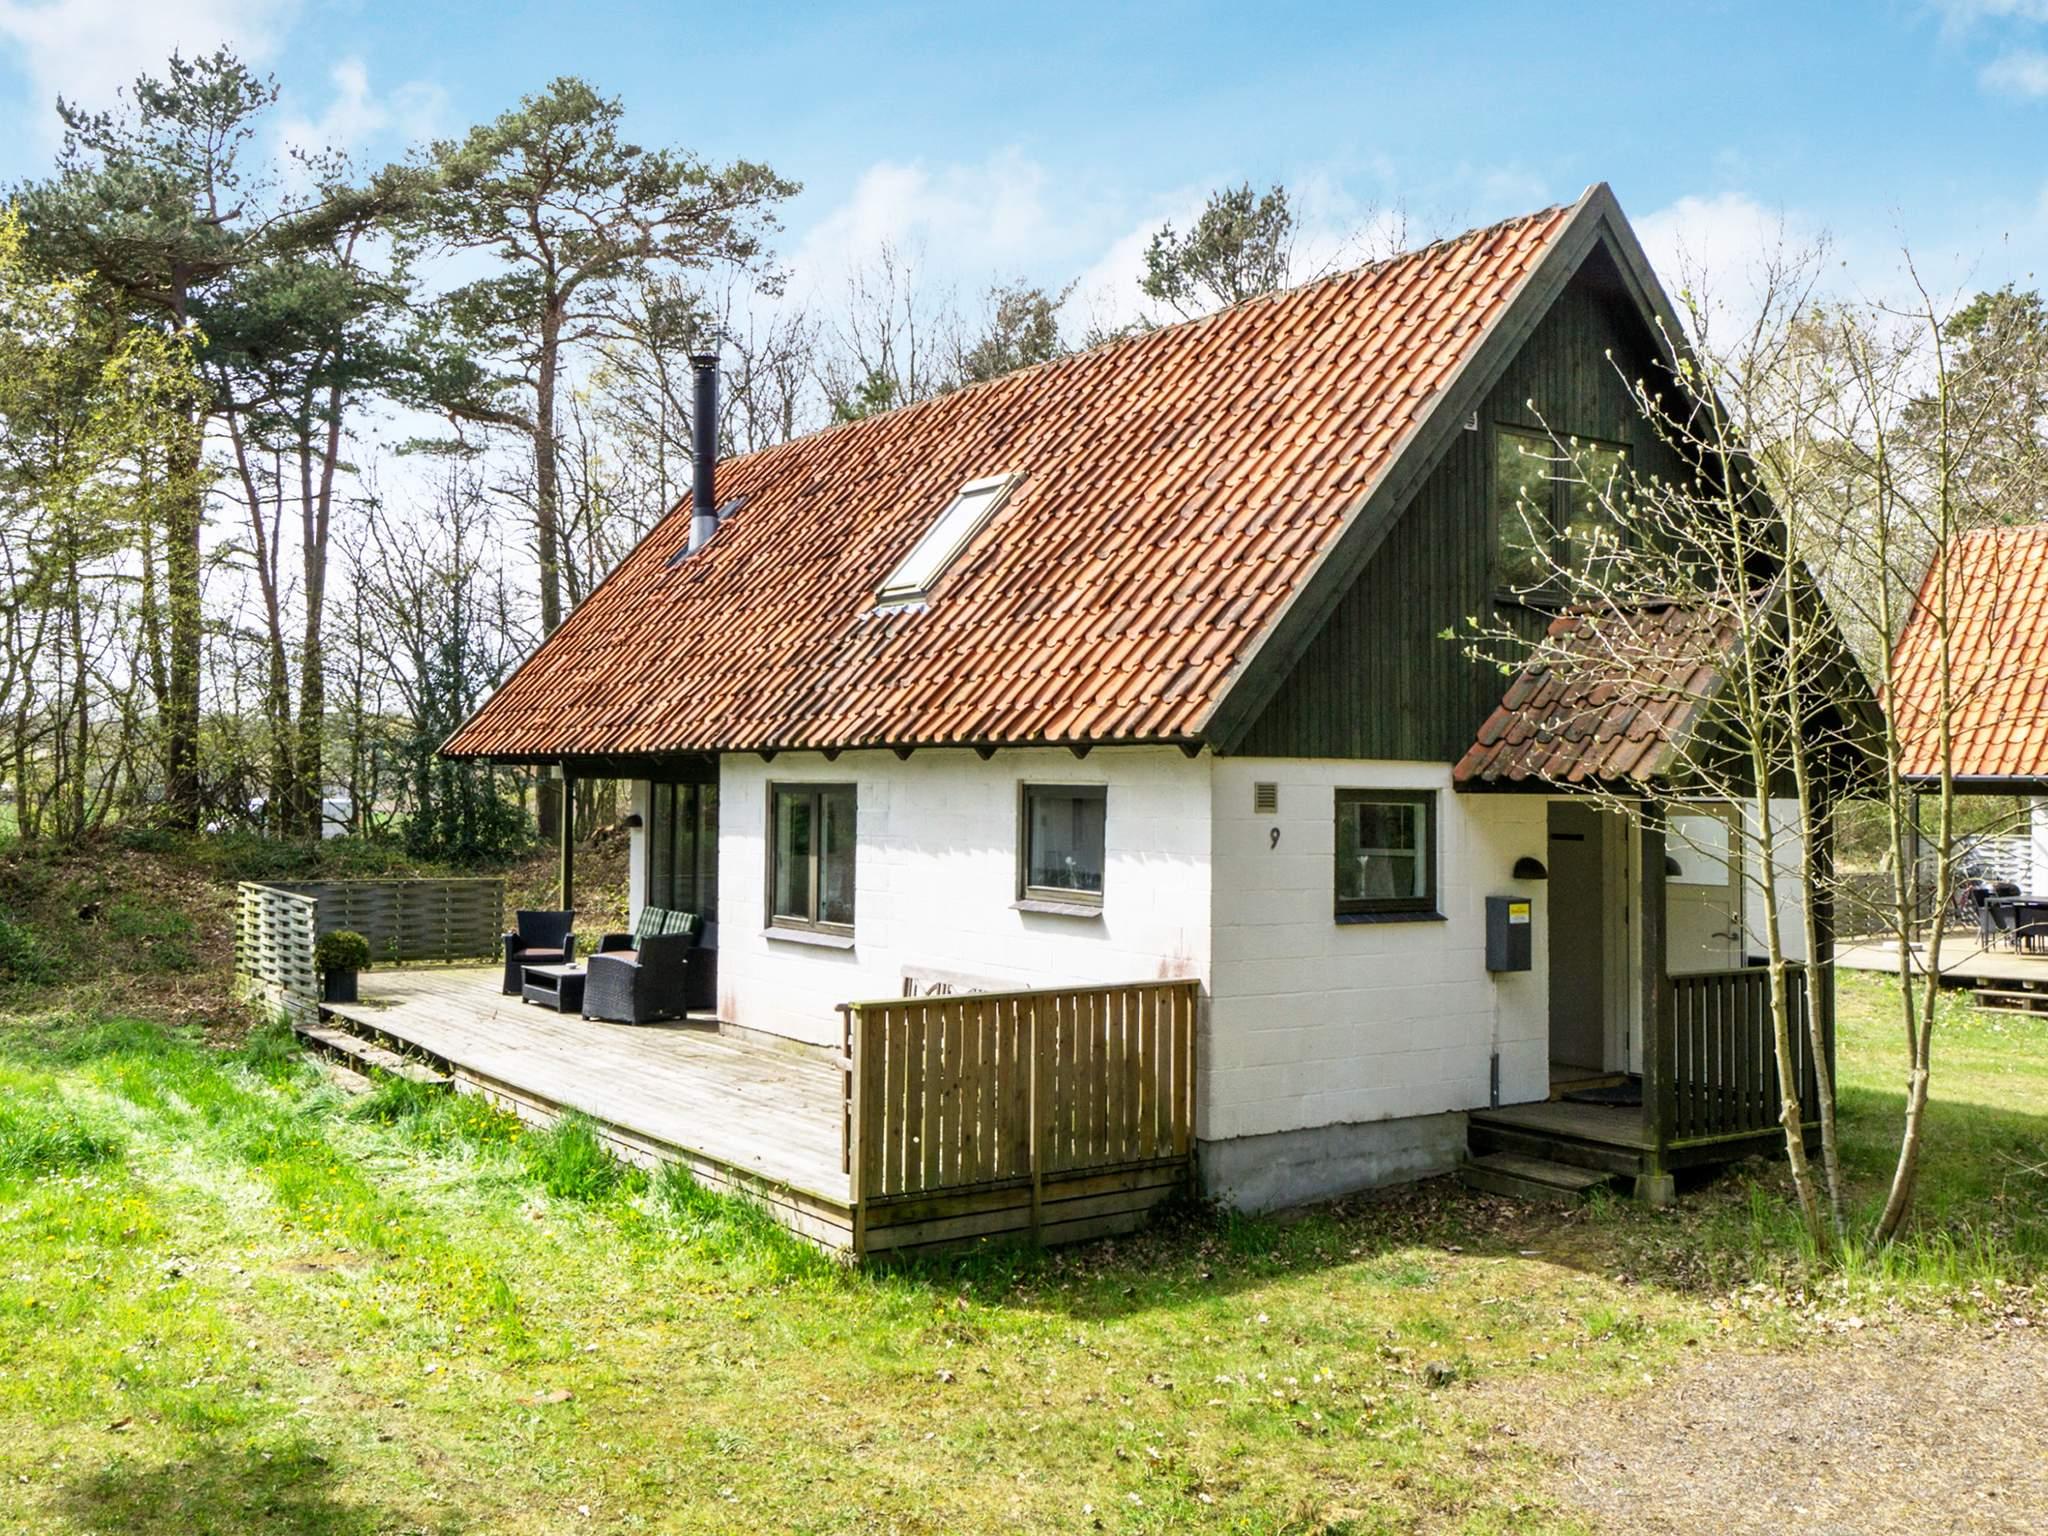 Ferienhaus Balka Strand (660138), Balke, , Bornholm, Dänemark, Bild 1